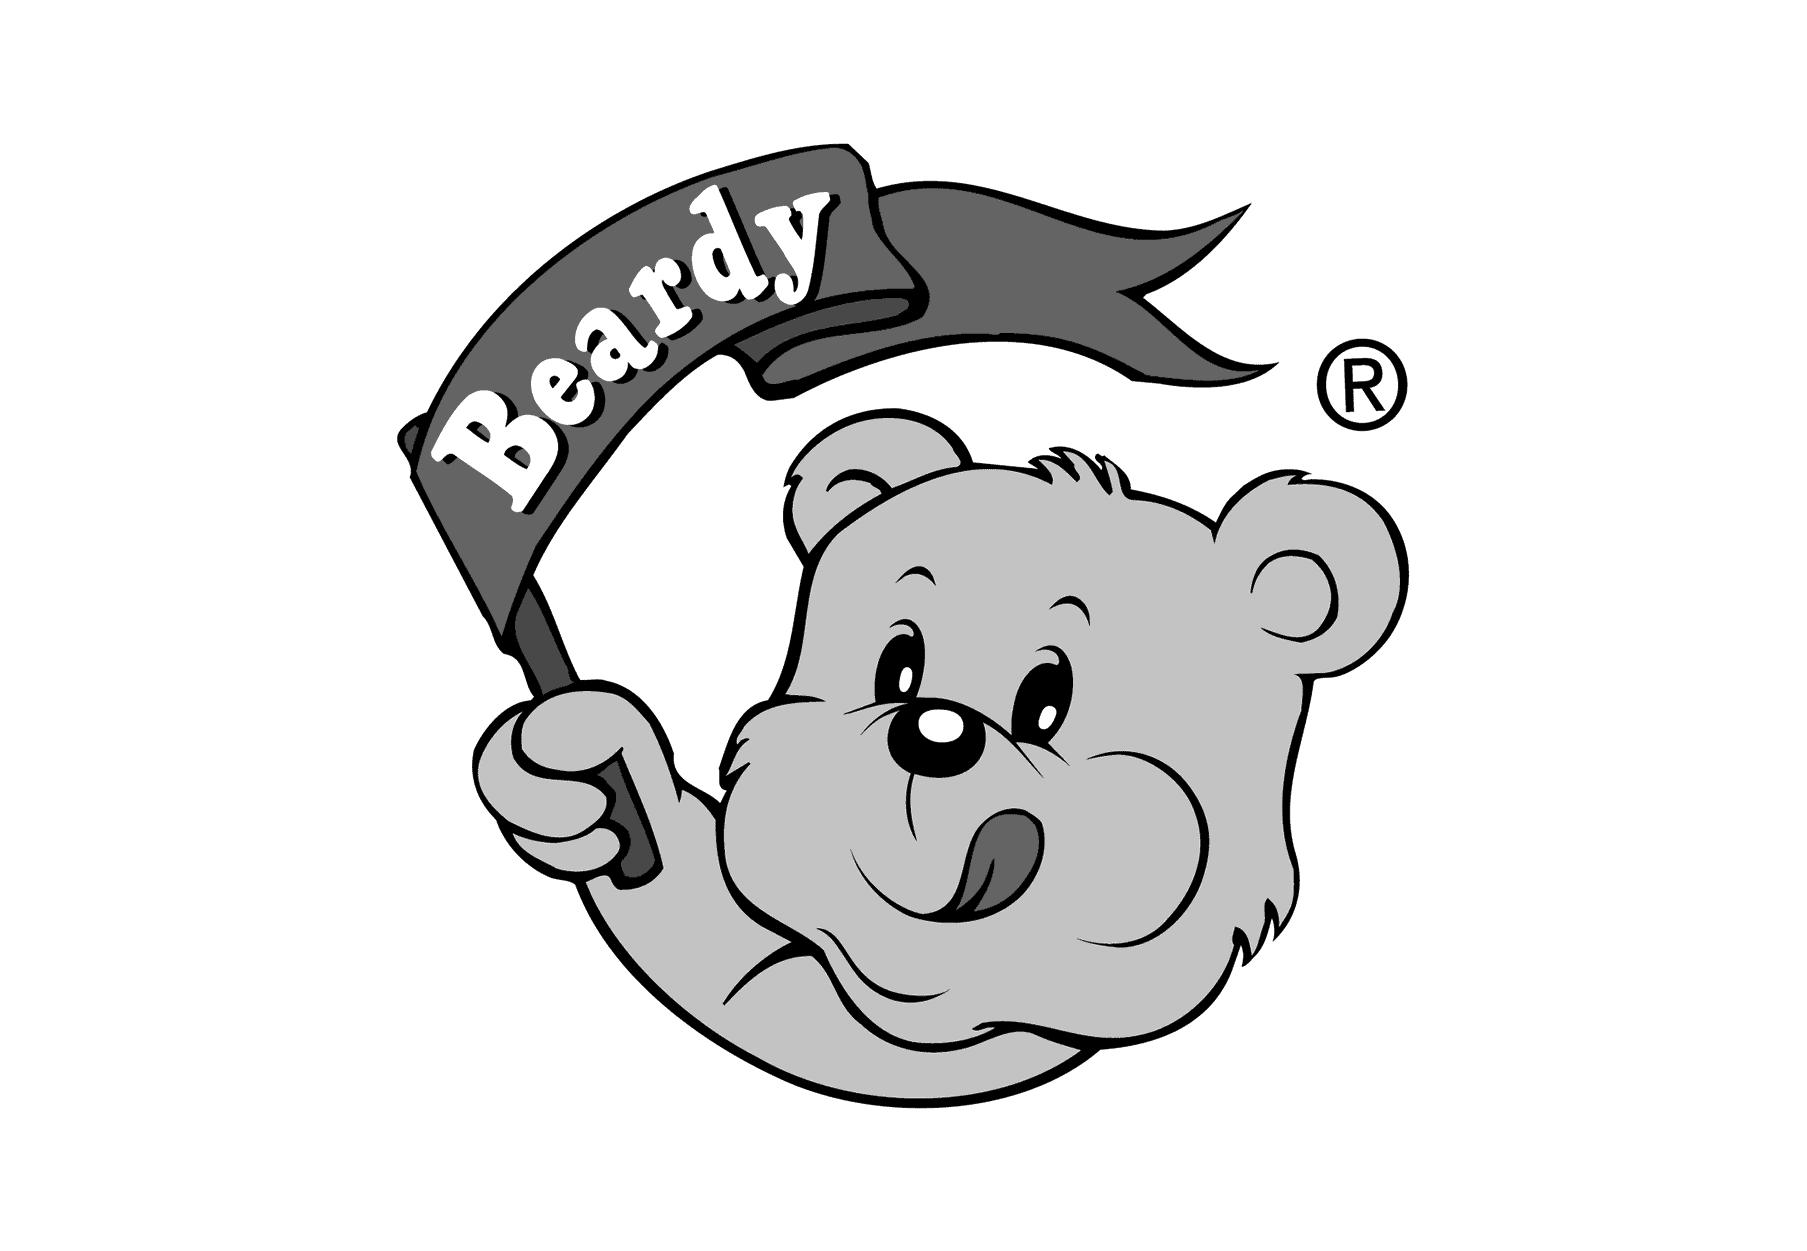 BEARDY-01 BW